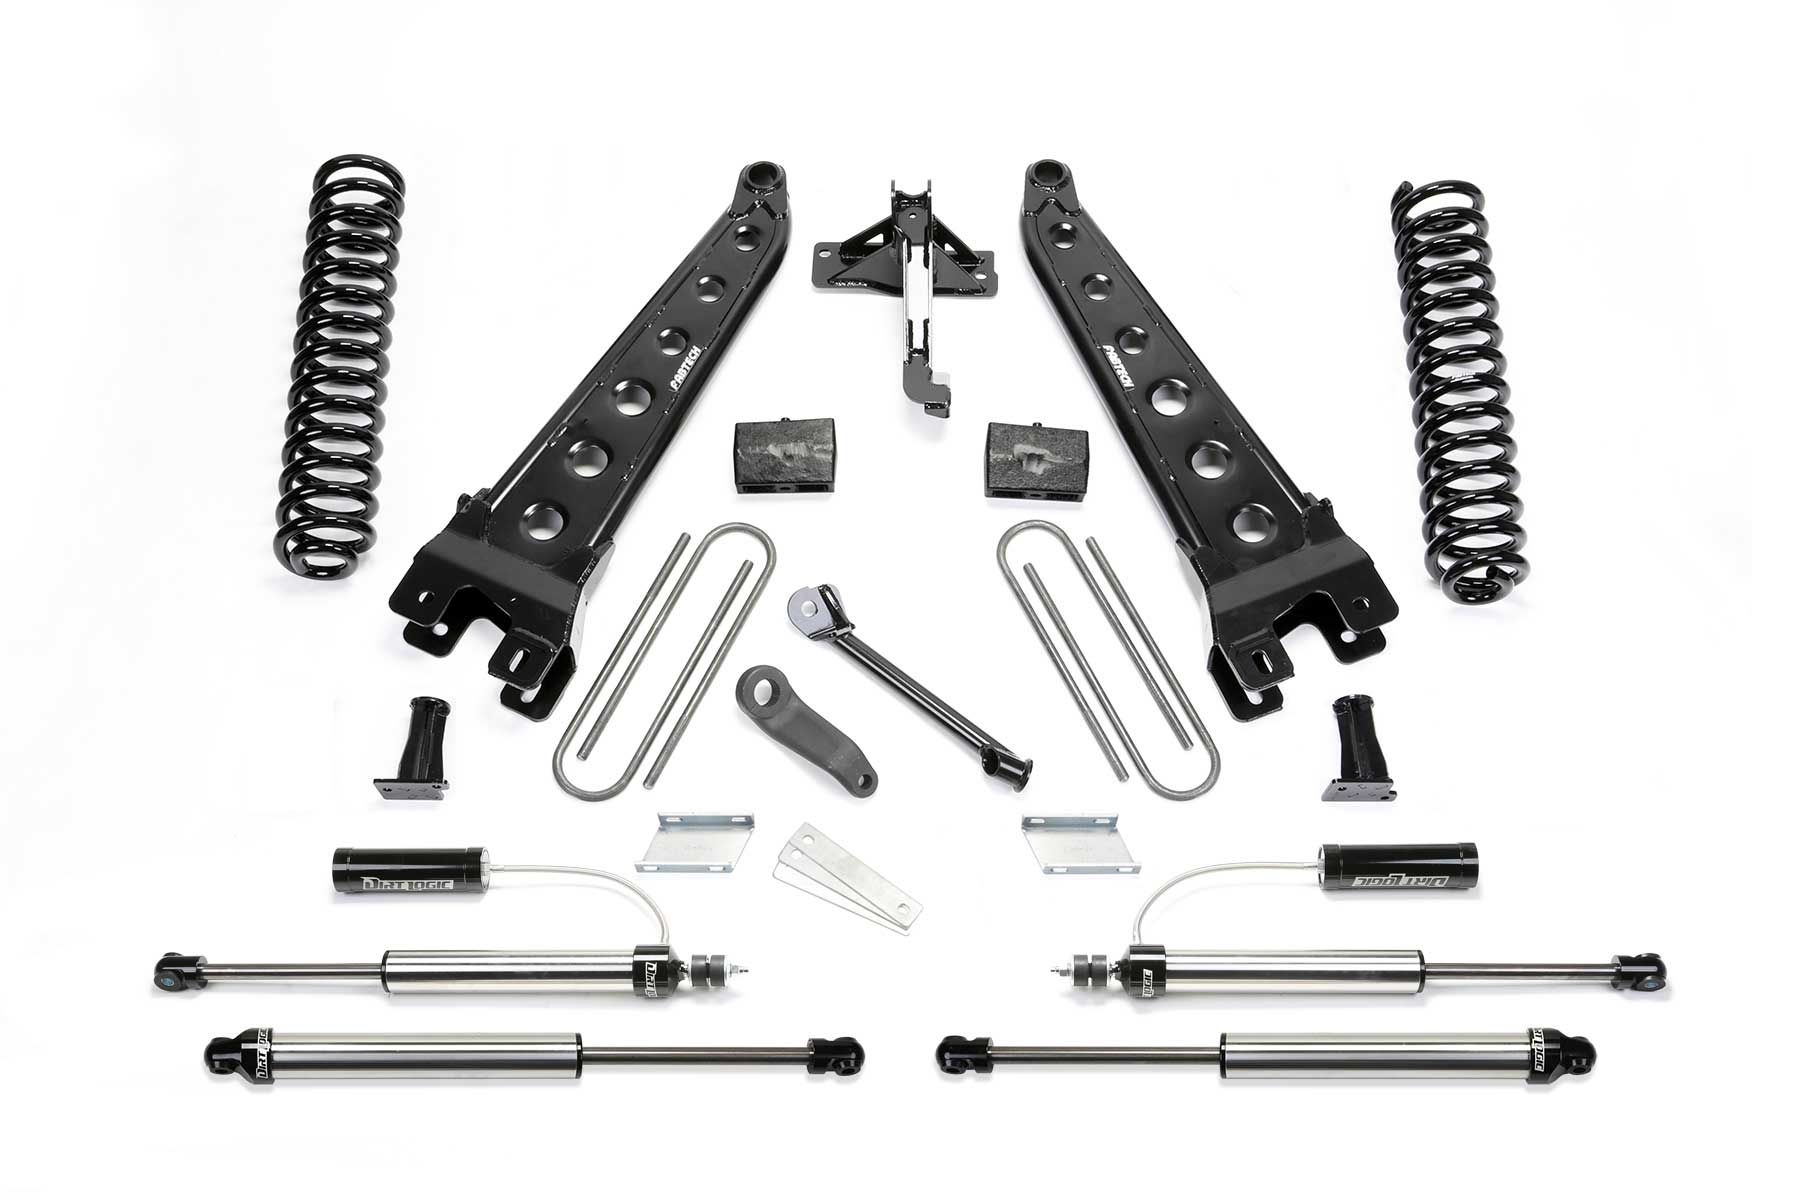 4 Radius Arm System W Front Dirt Logic 2 25 Resi Shocks Amp Rear Dirt Logic Shocks